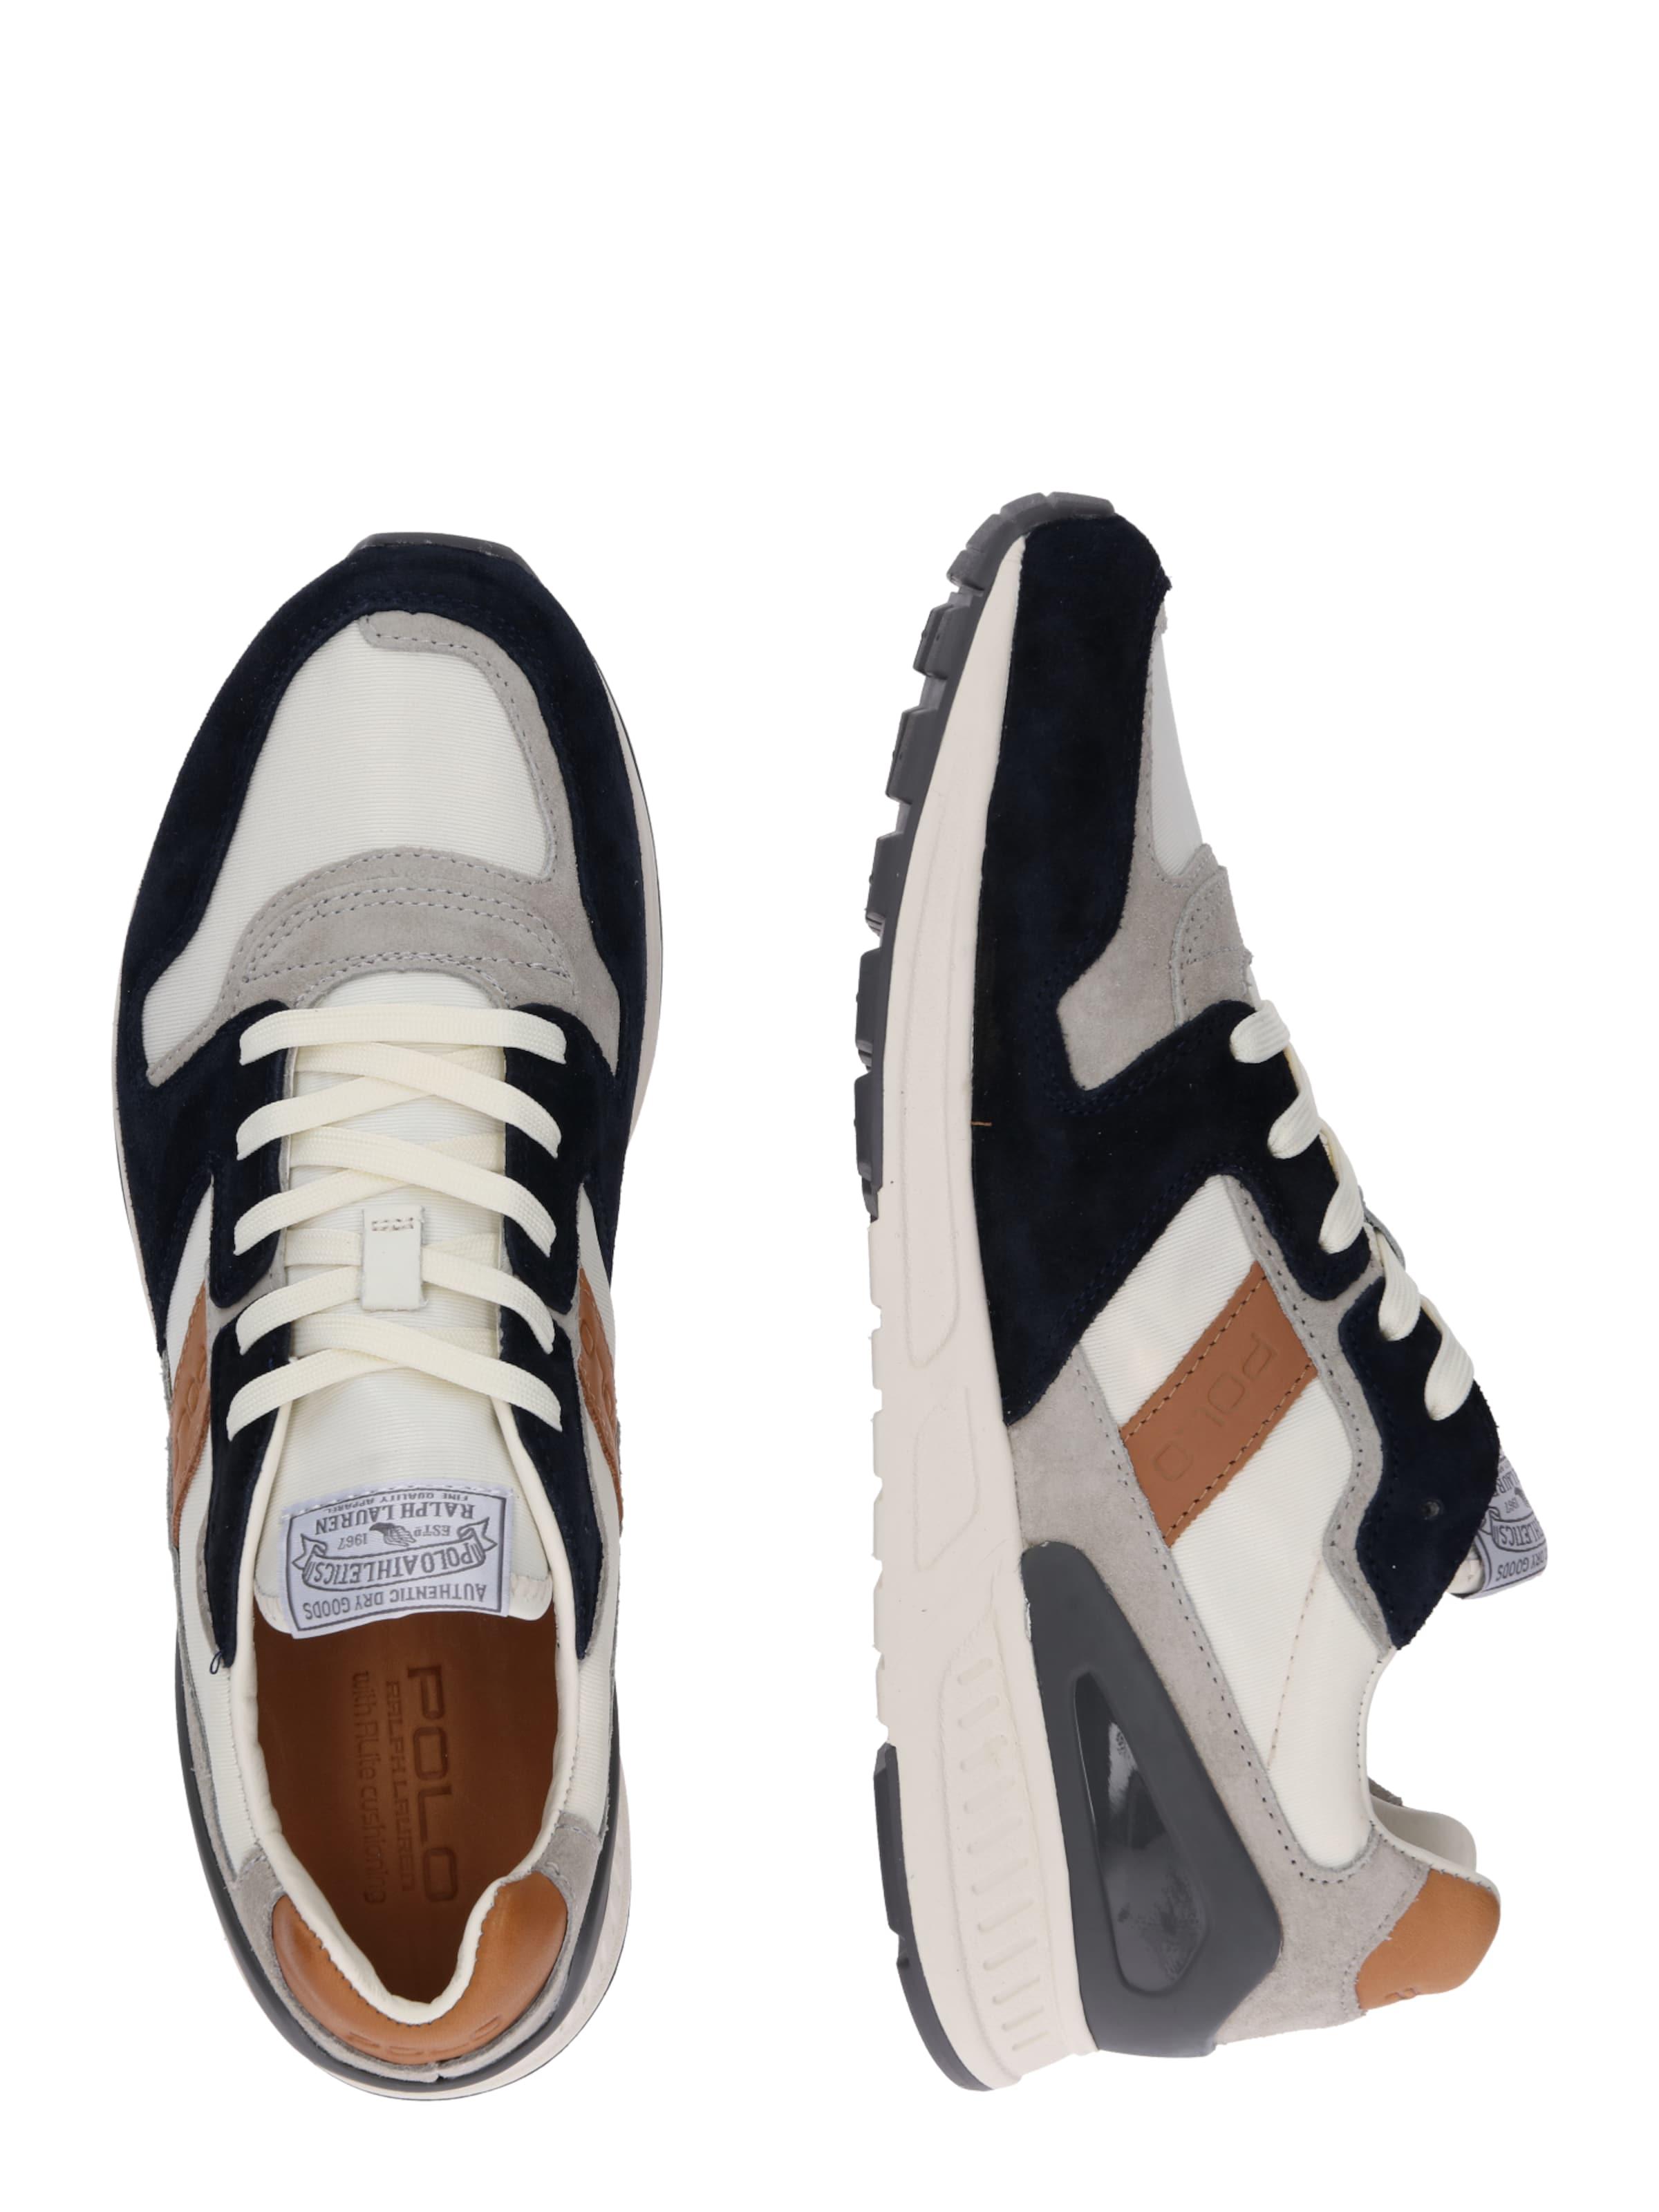 100 Polo Nylon' 'train NavyHellbraun Sneaker Ralph In Naturweiß Lauren H2E9eYWbID